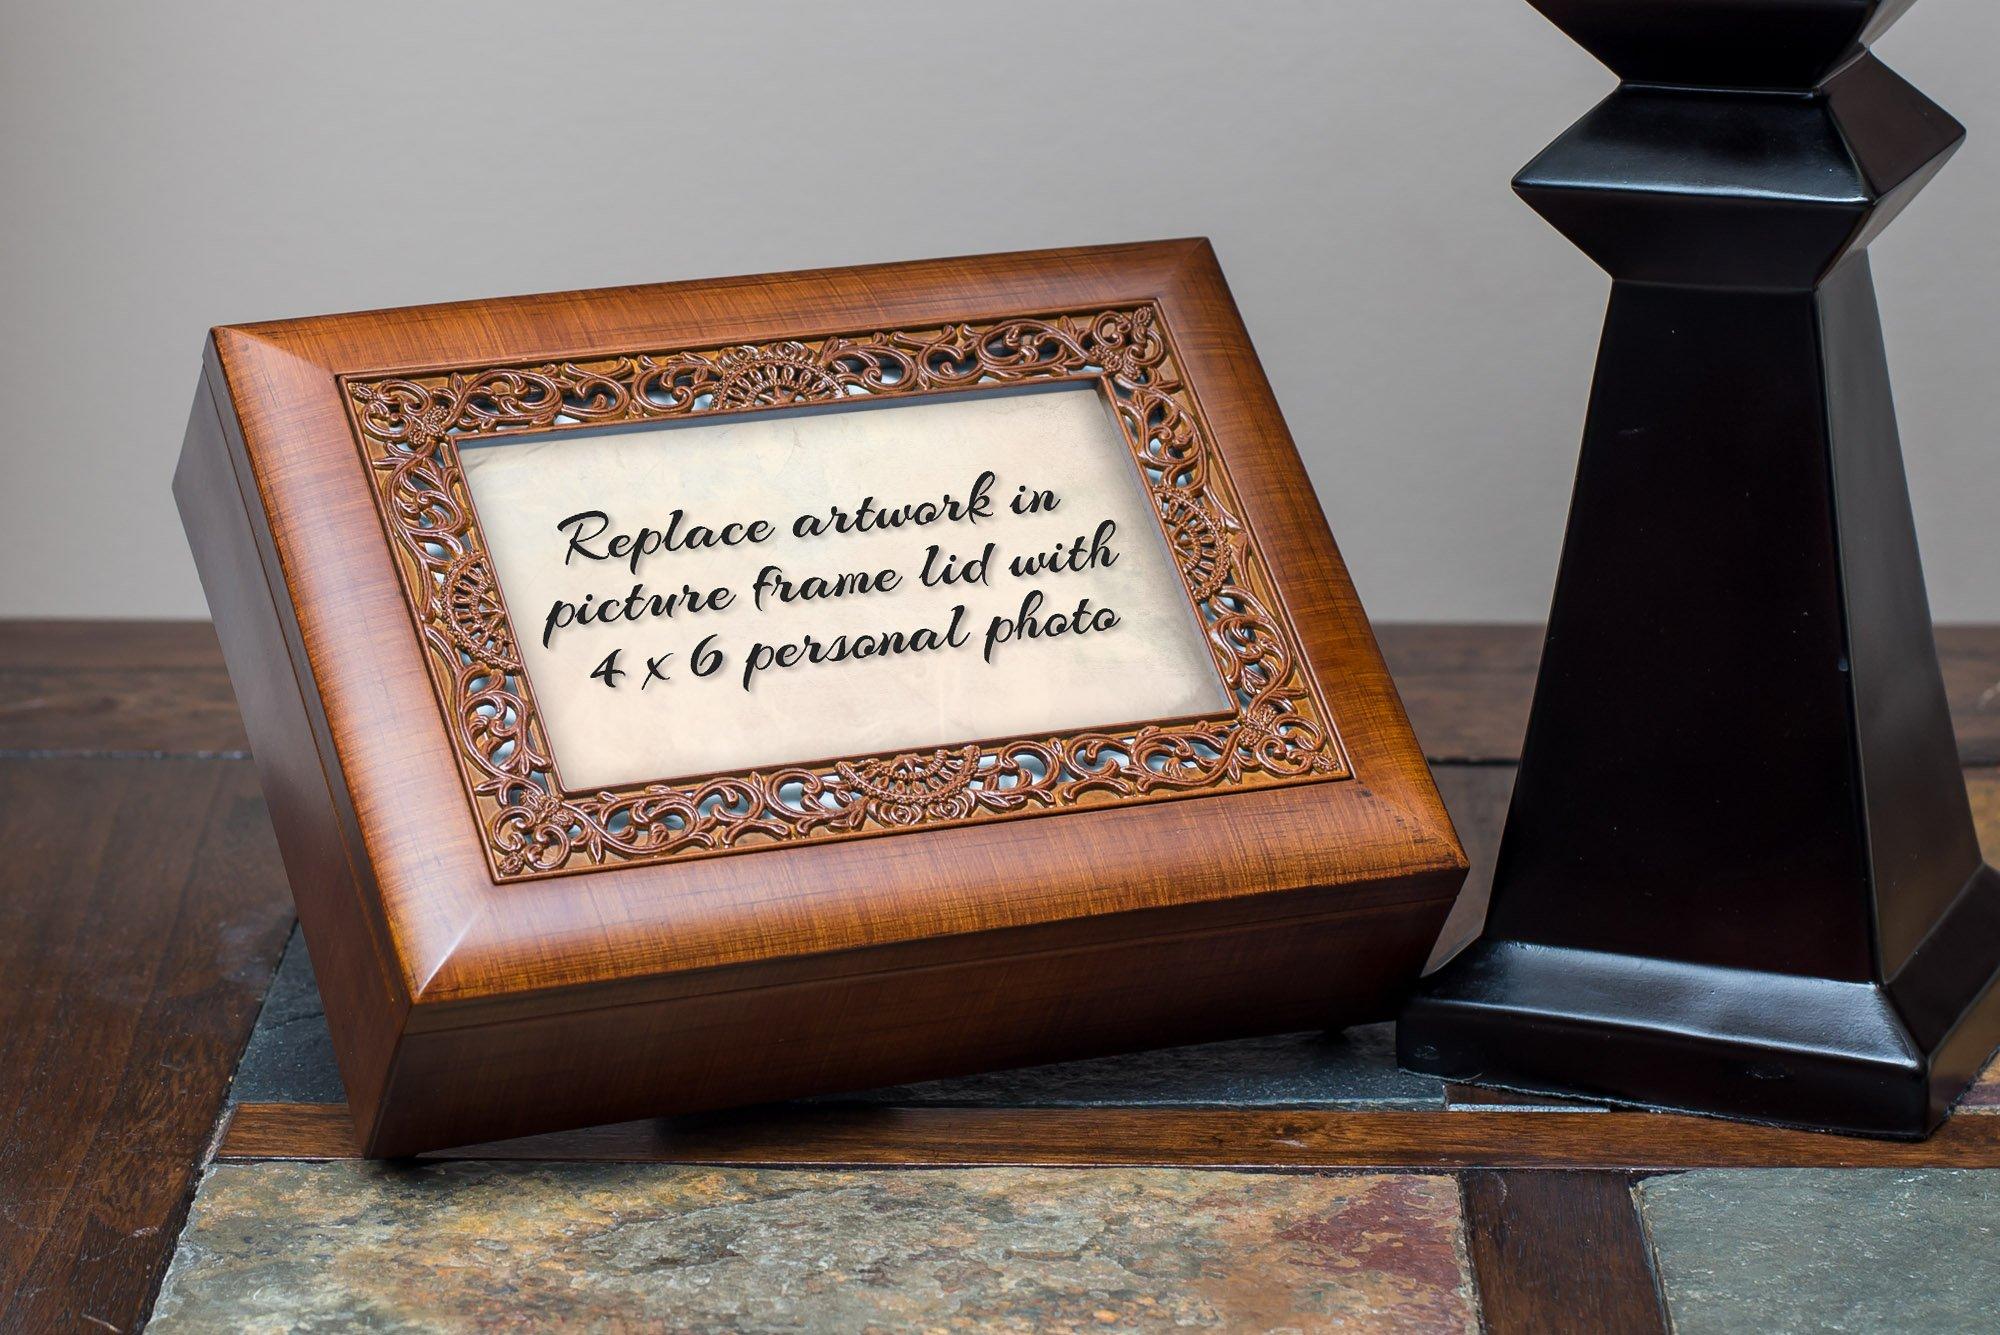 Cottage Garden Sister Woodgrain Ornate Music Box Plays Wonderful World by Cottage Garden (Image #4)